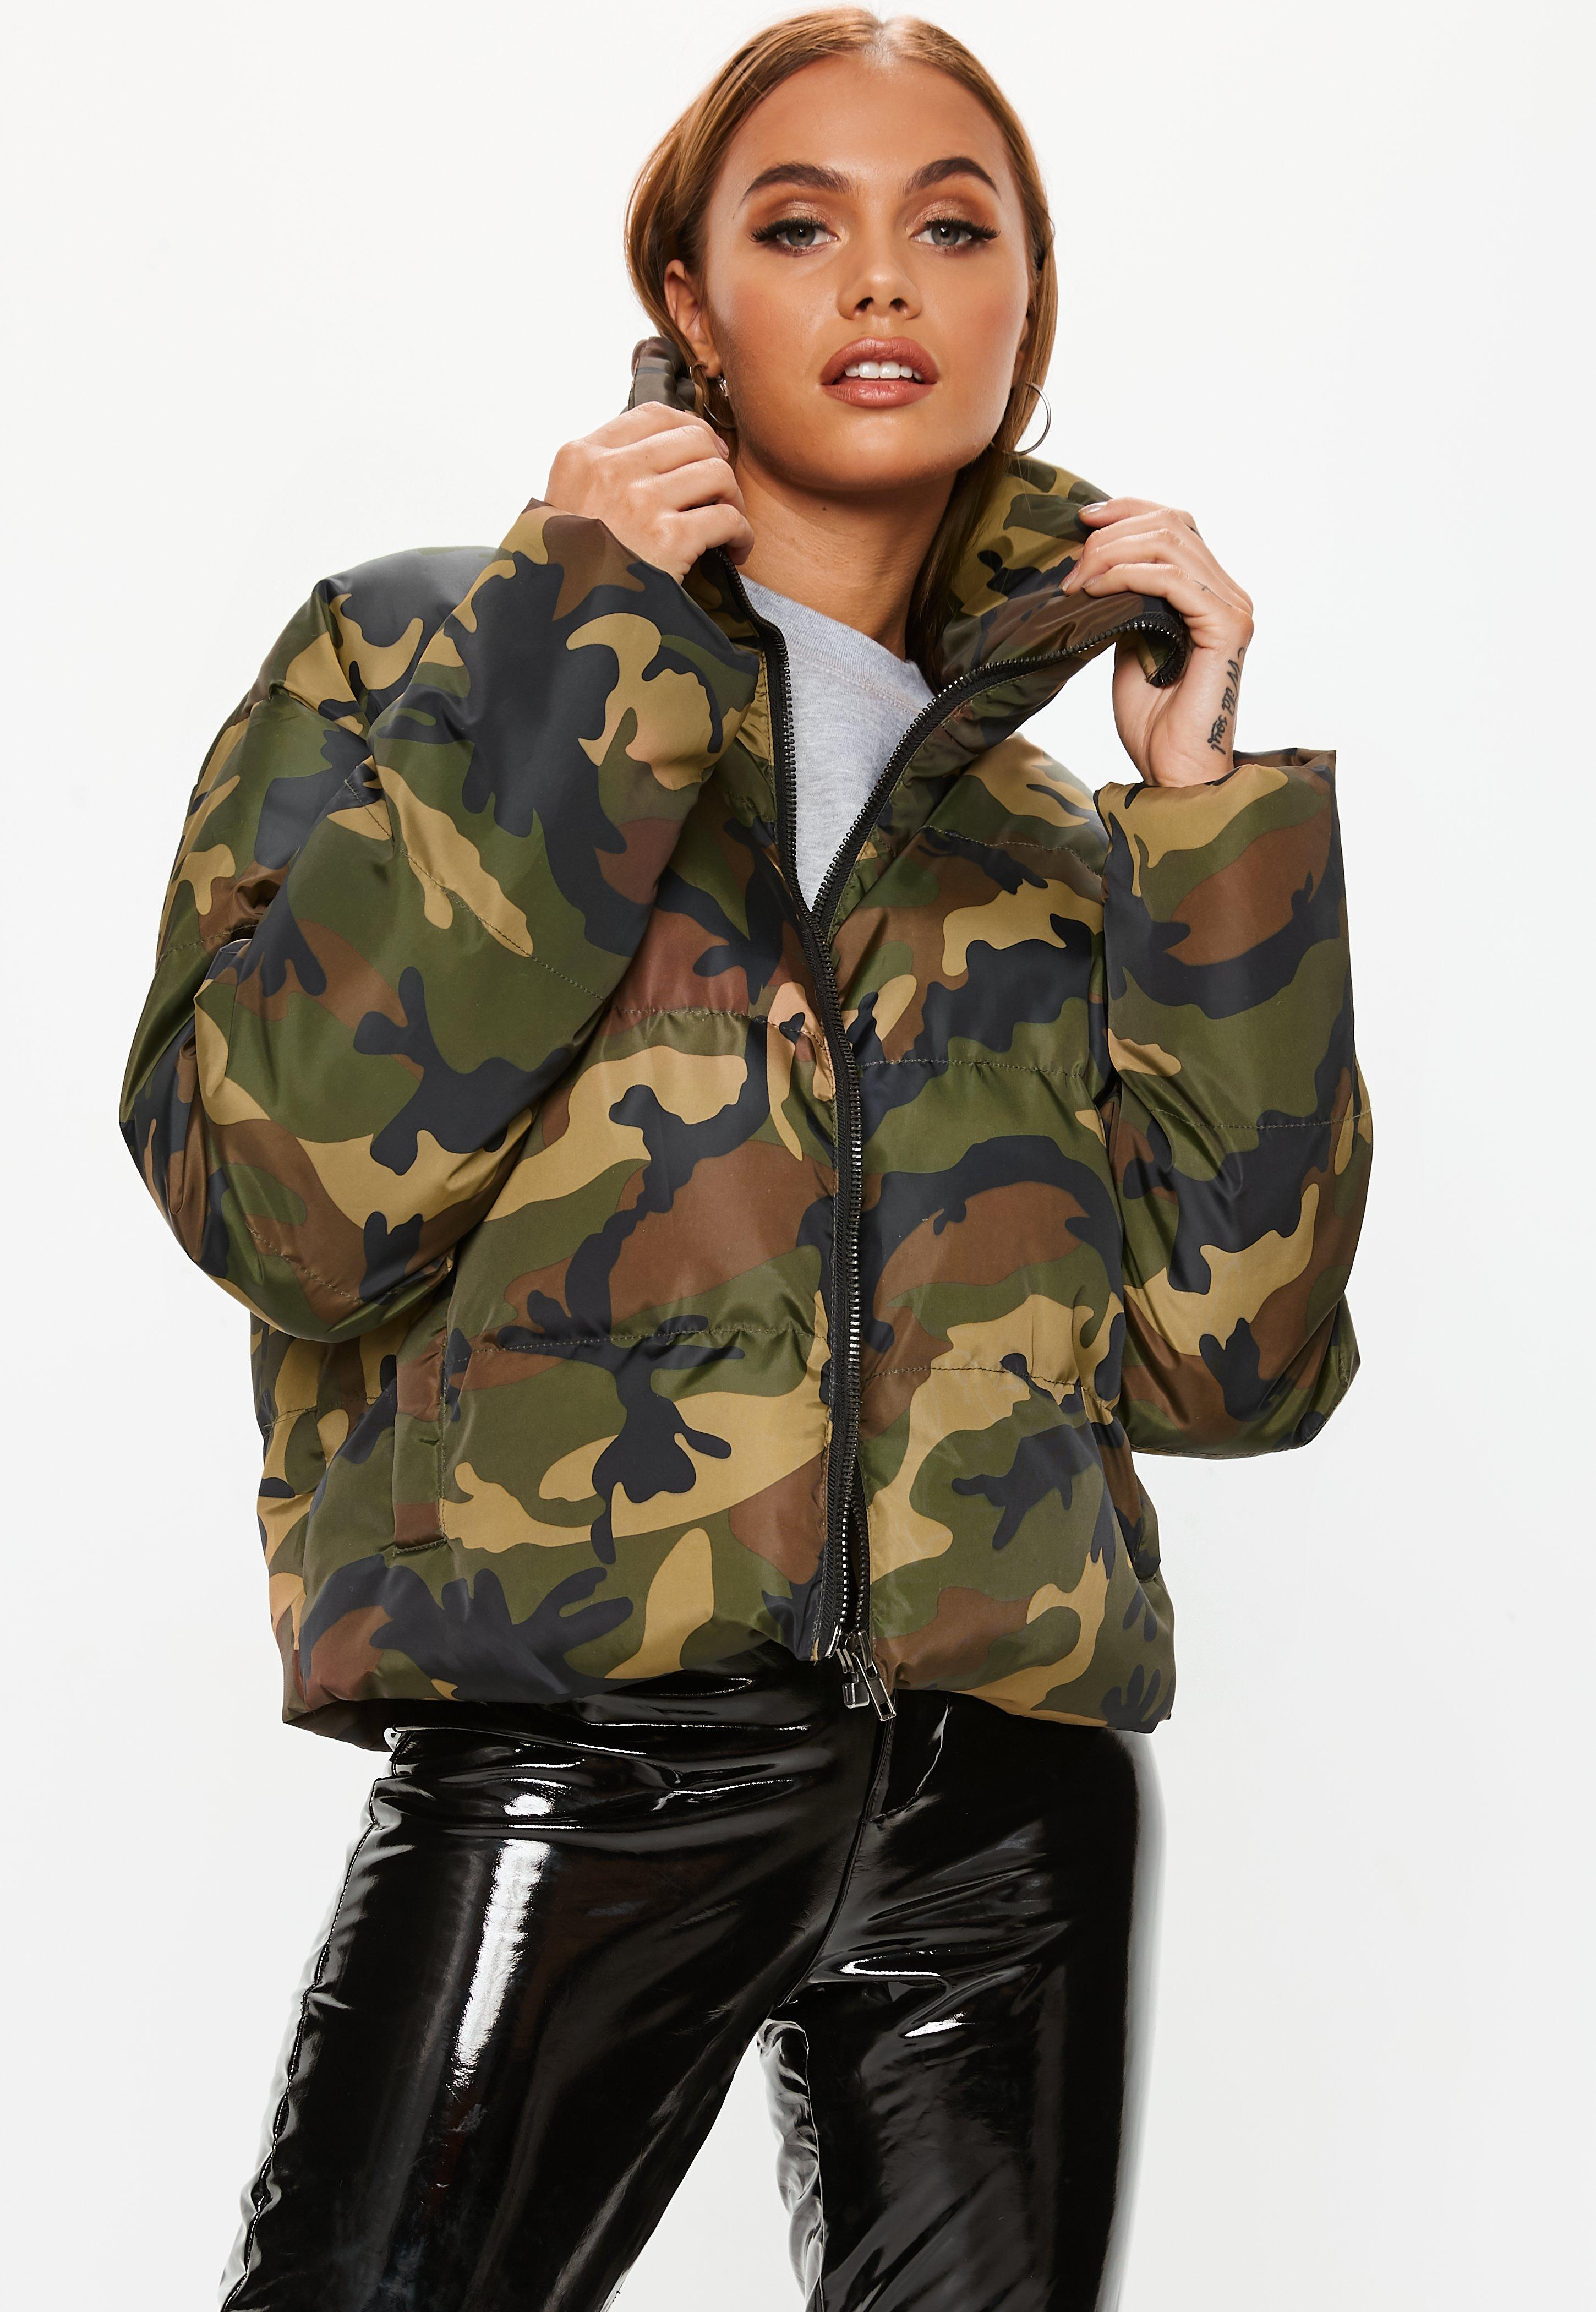 b43a1d30b0f85 Missguided. Women's Khaki Camo Cropped Puffer Jacket